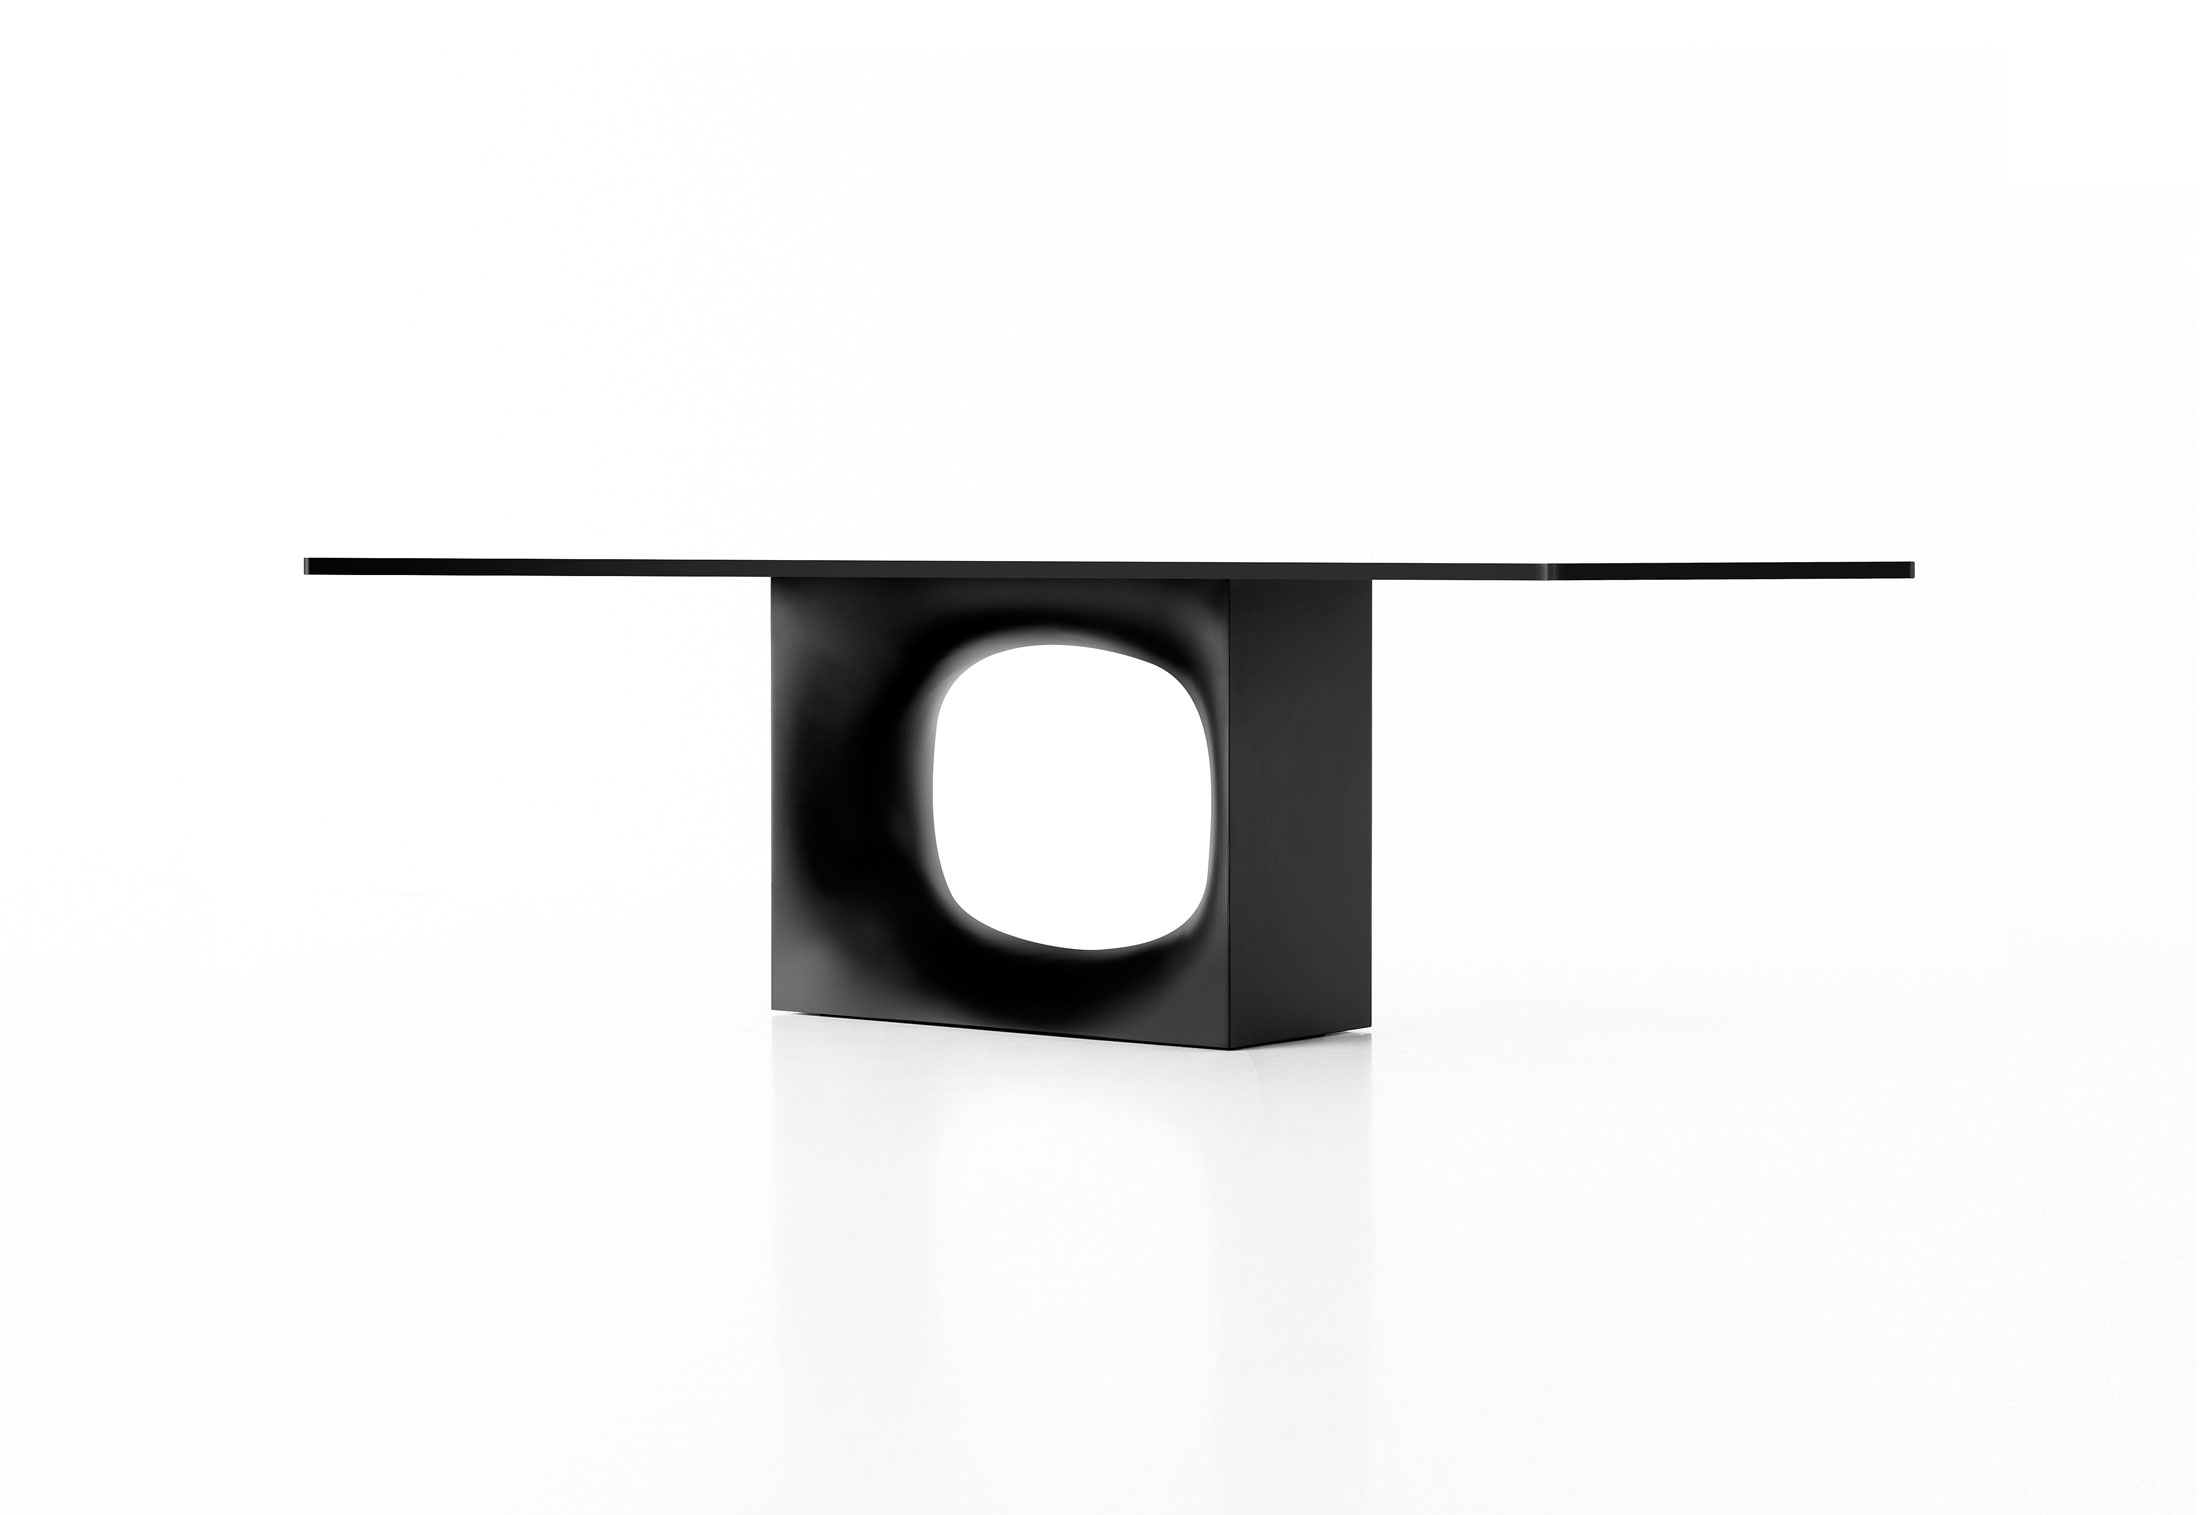 Hole Dining Table by Kensaku Oshiro for Kristalia